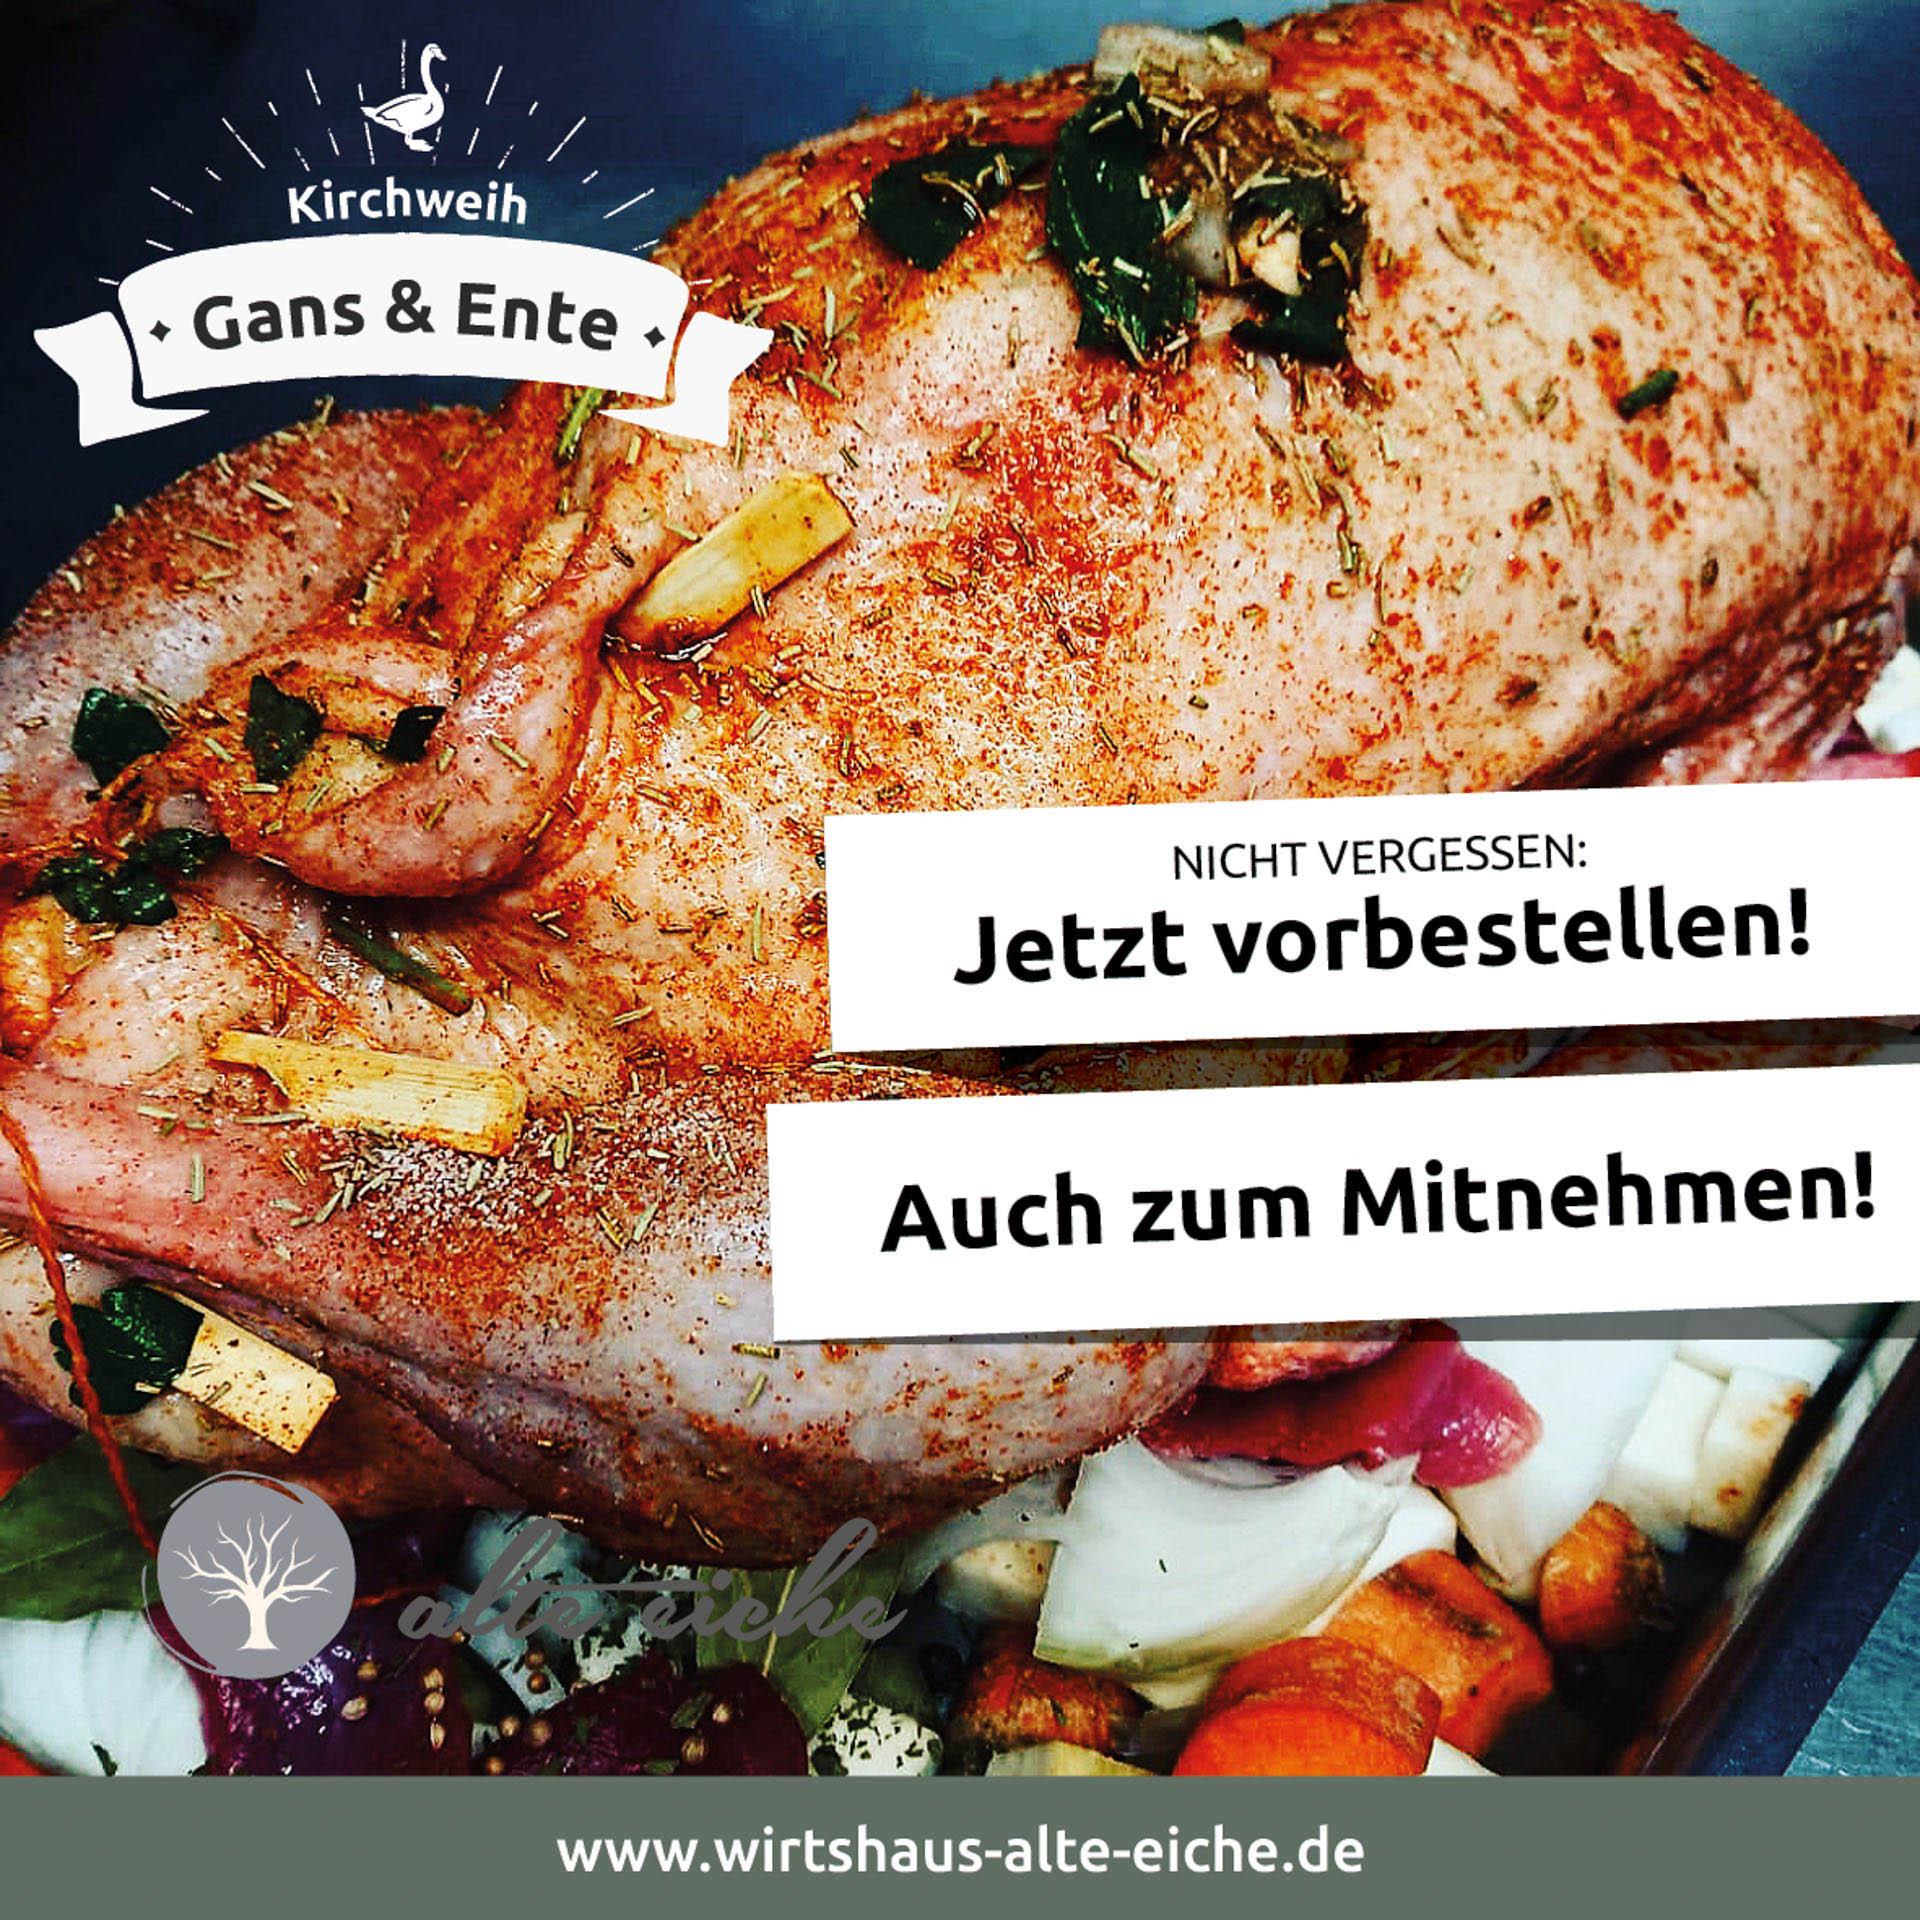 gniced-daniel gross-pfaffenhofen-grafikdesign-digital-assets-posting-10